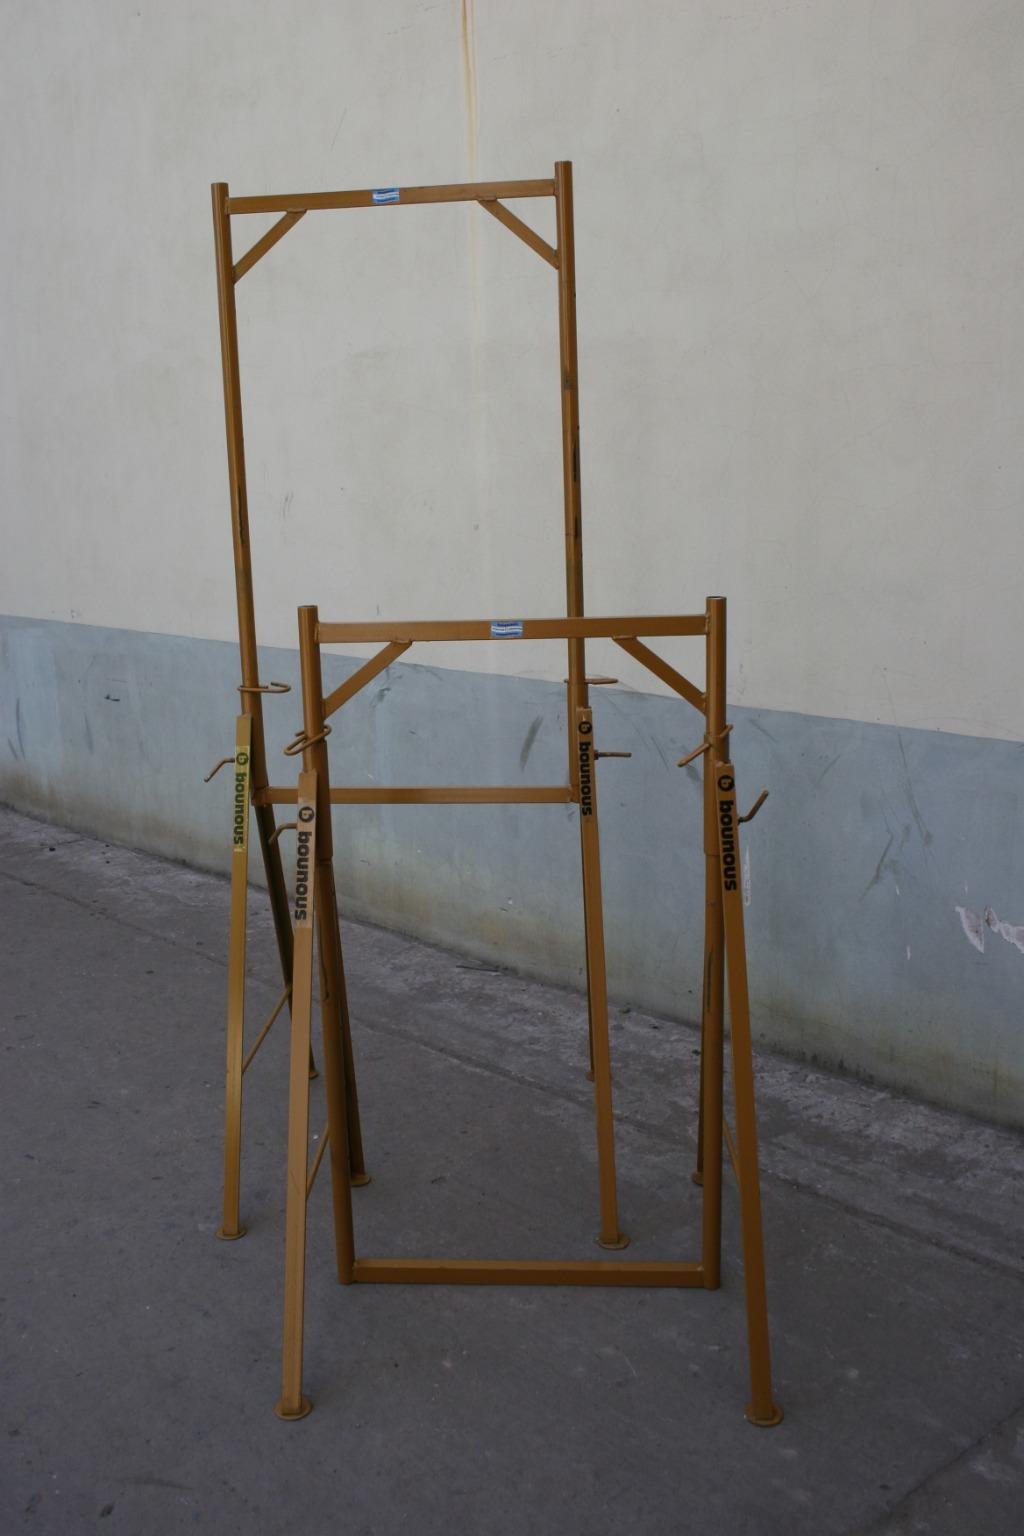 CABALLETE CBM-120 ANGULO